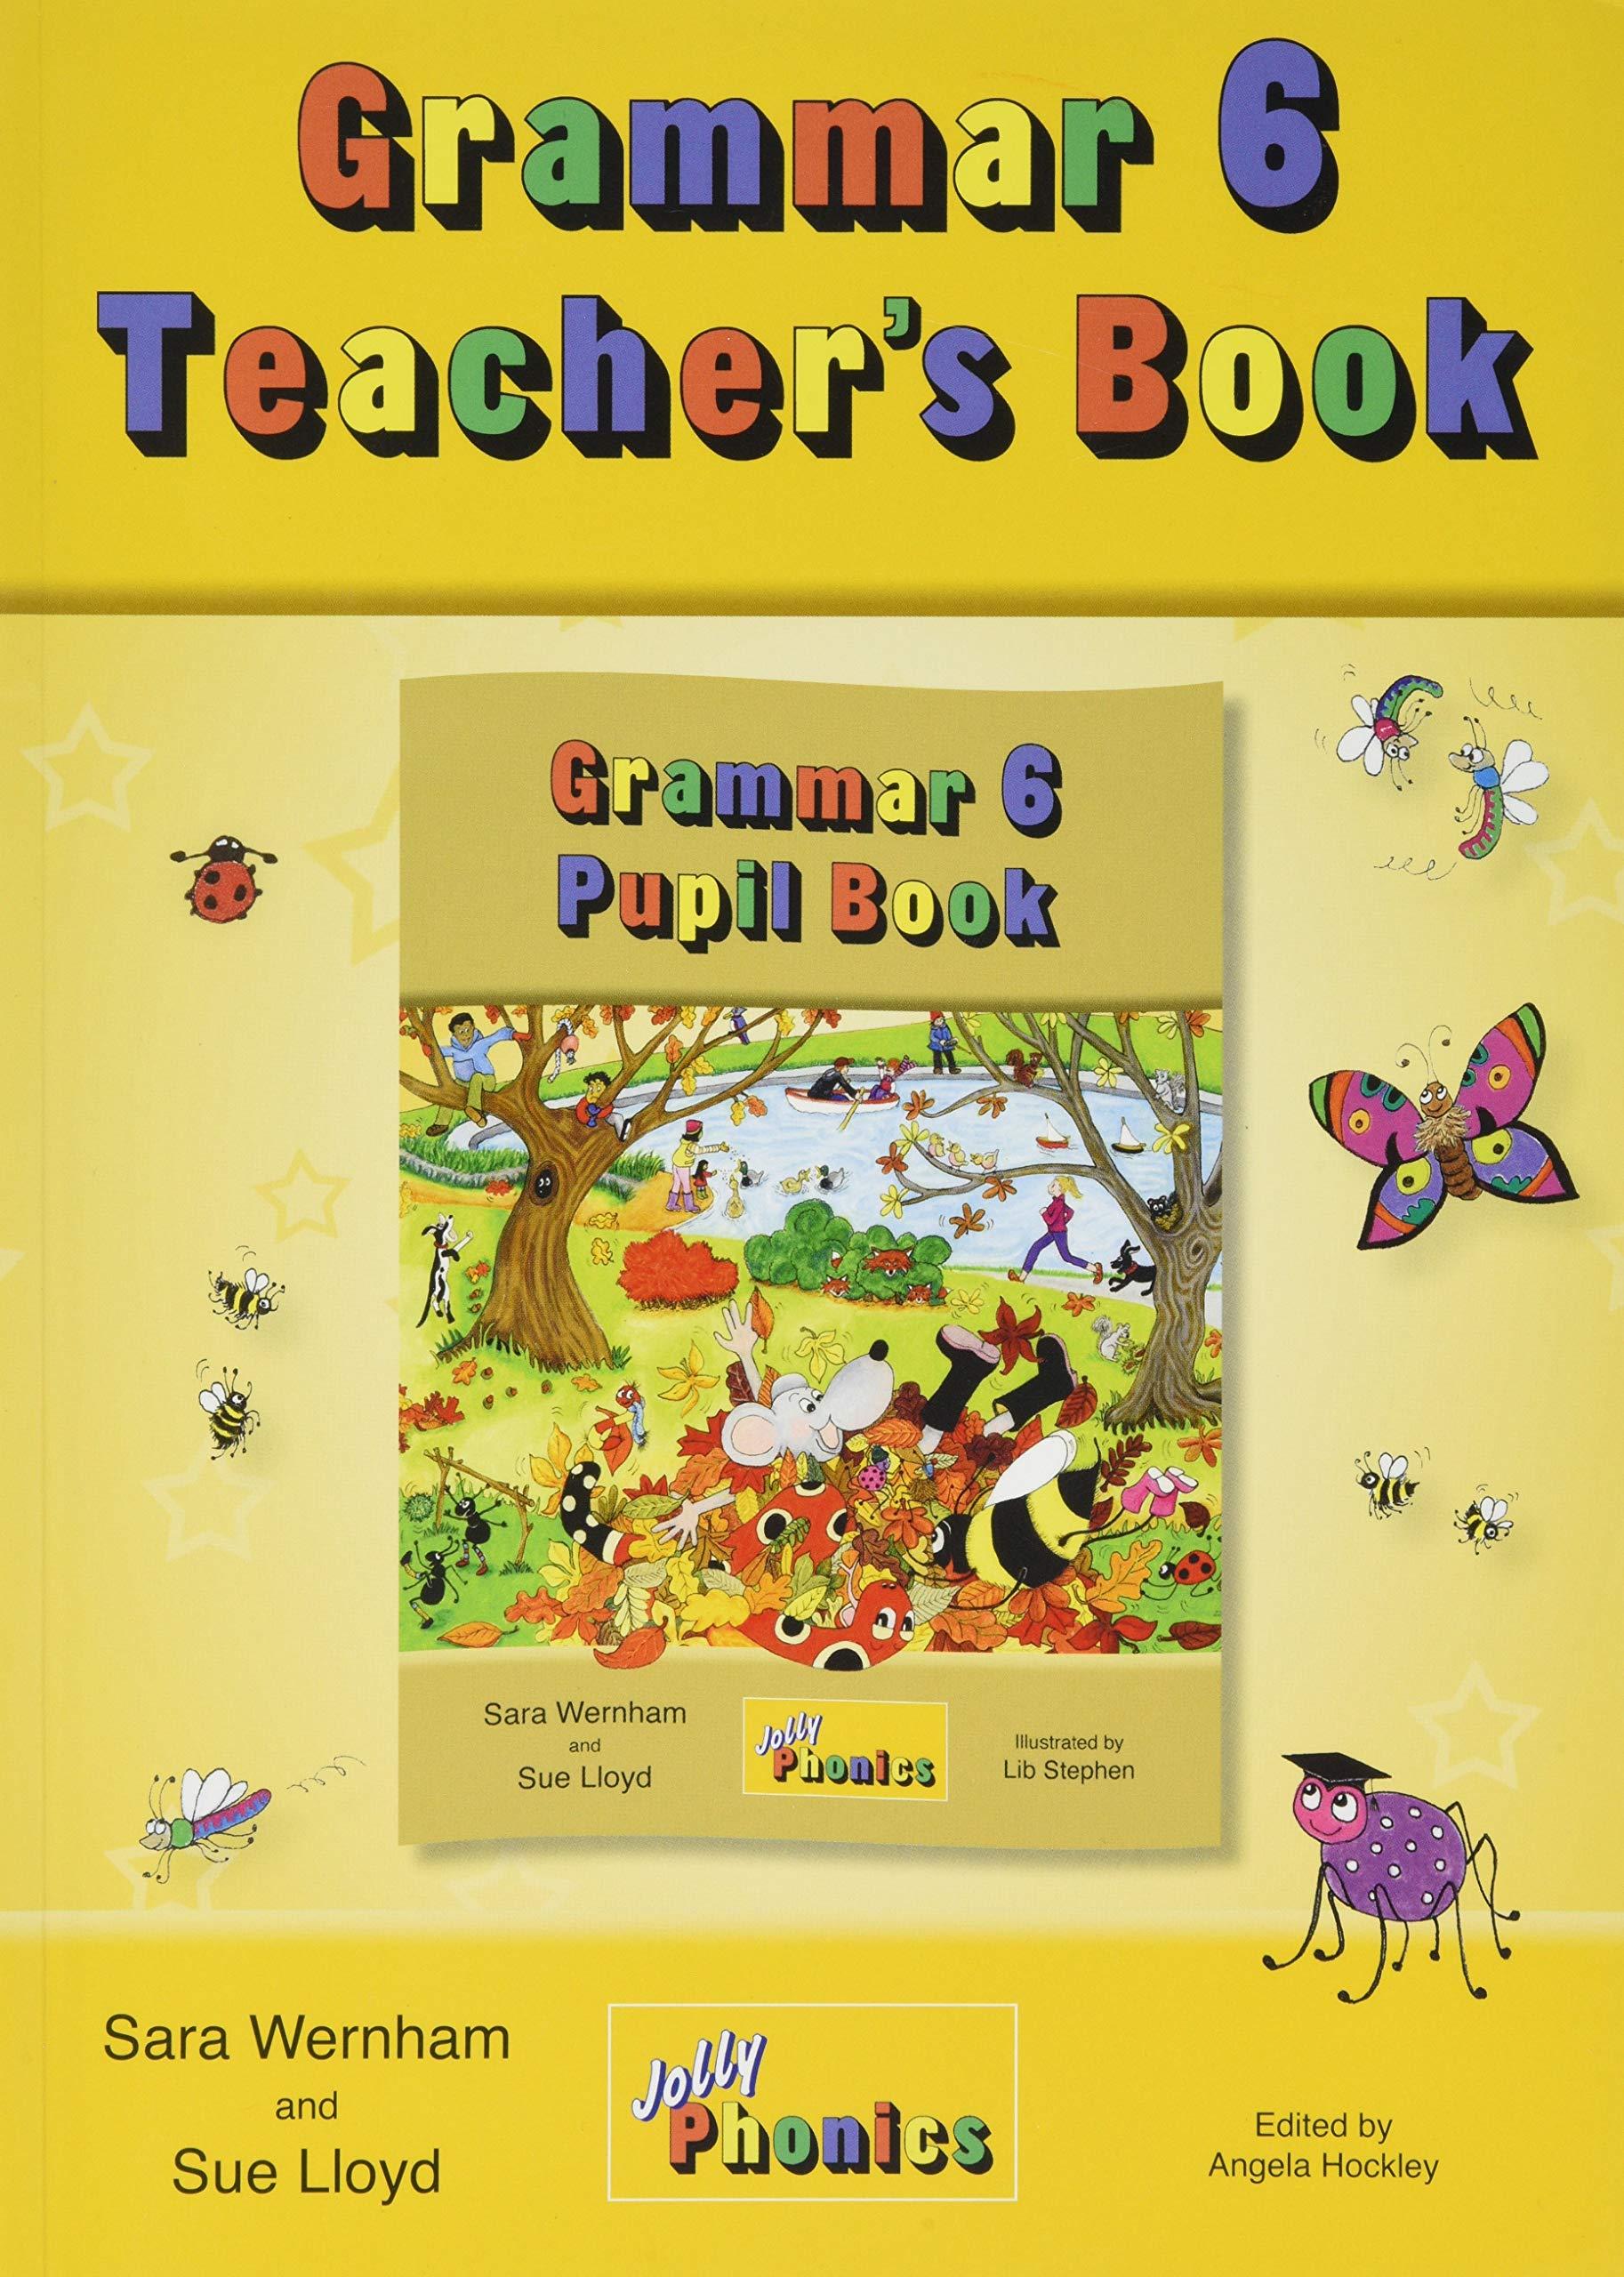 Grammar 6 Teacher's Book: In Precursive Letters (British English edition)  Paperback – Teacher's Edition, 1 Feb 2018